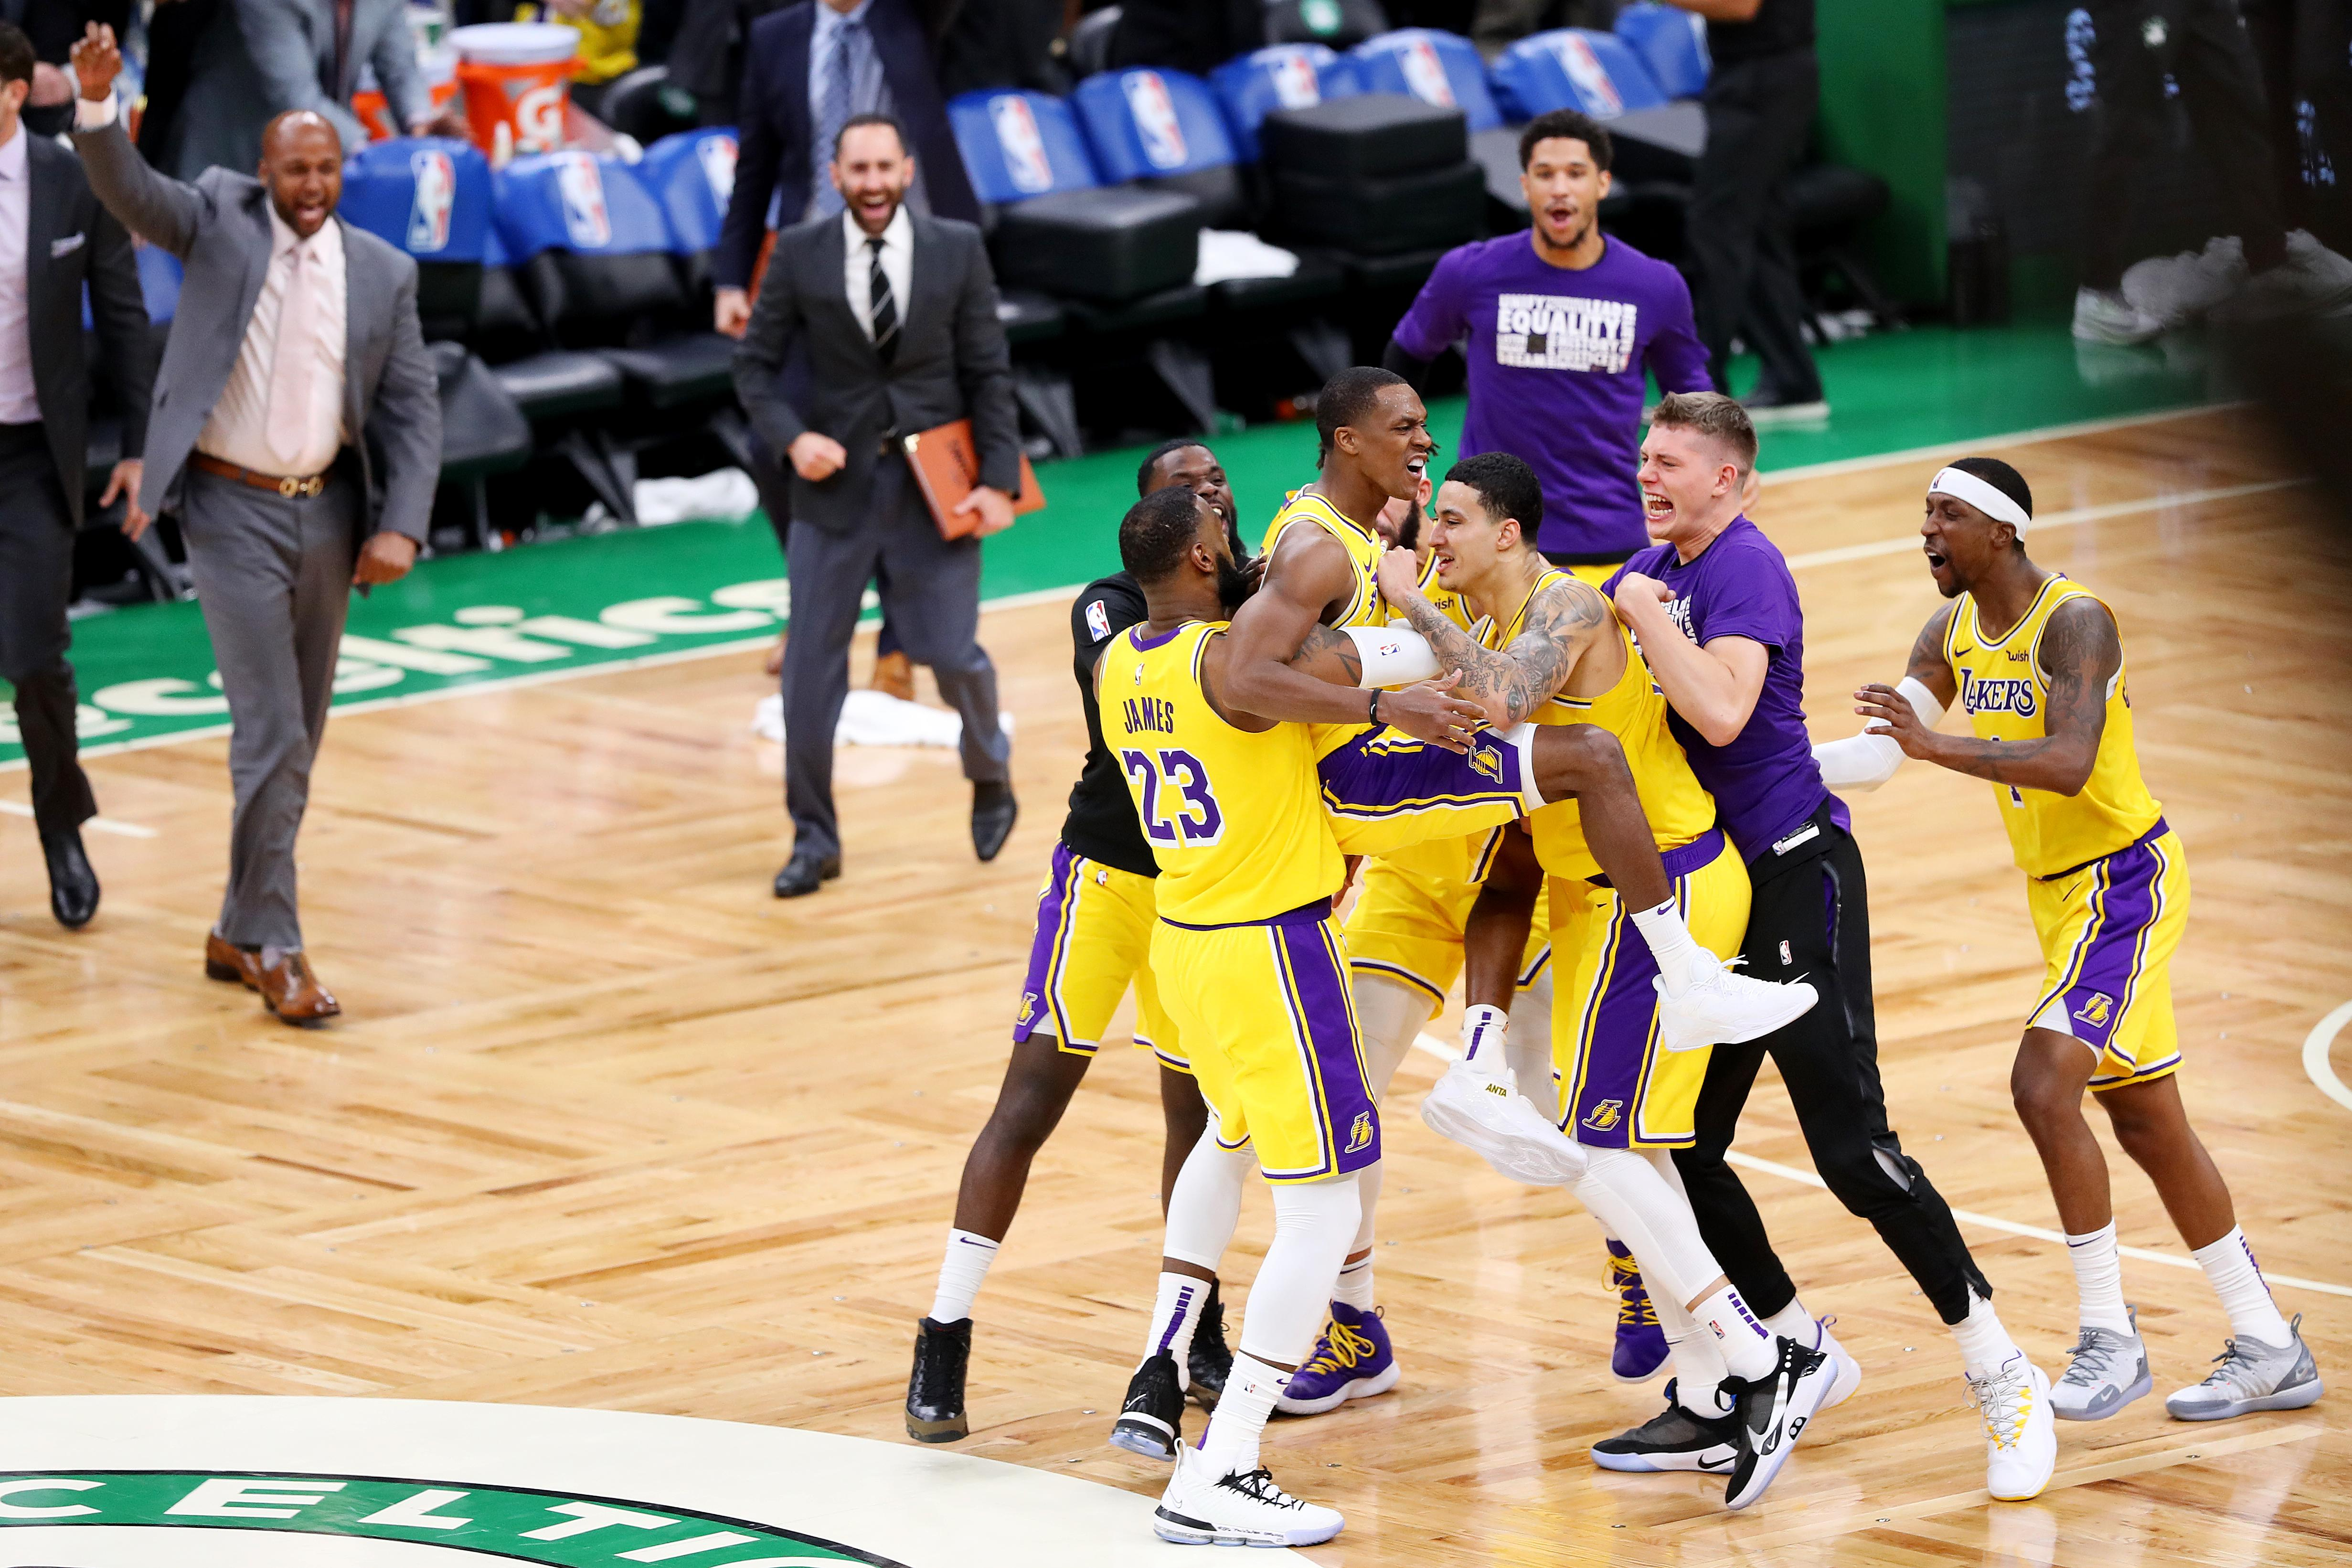 6998f5637 Lakers take down Celtics on buzzer-beater from Rajon Rondo